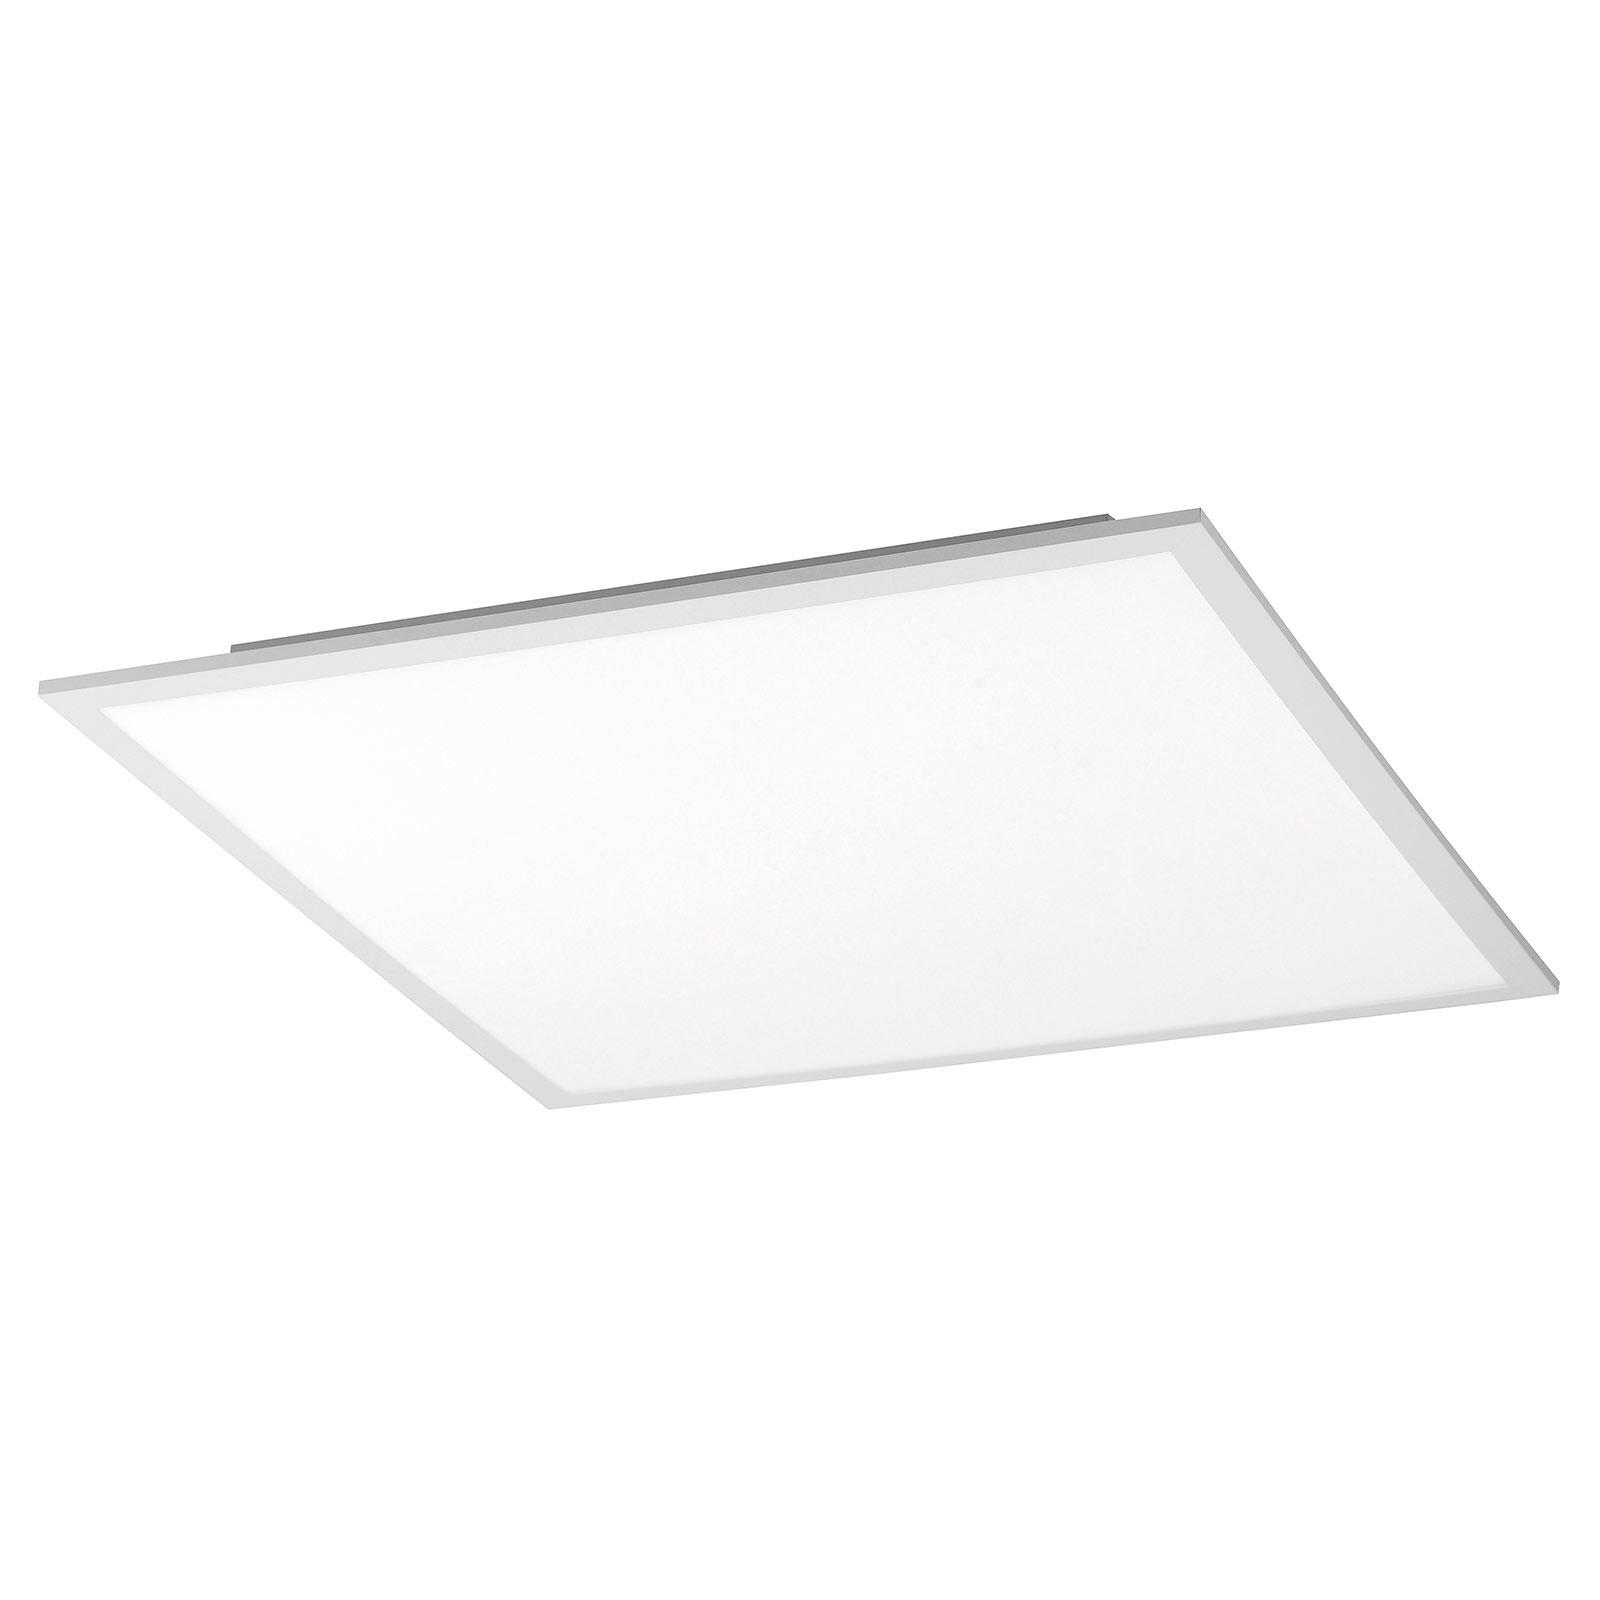 Plafonnier LED LOLAsmart Flat, 45 x 45cm